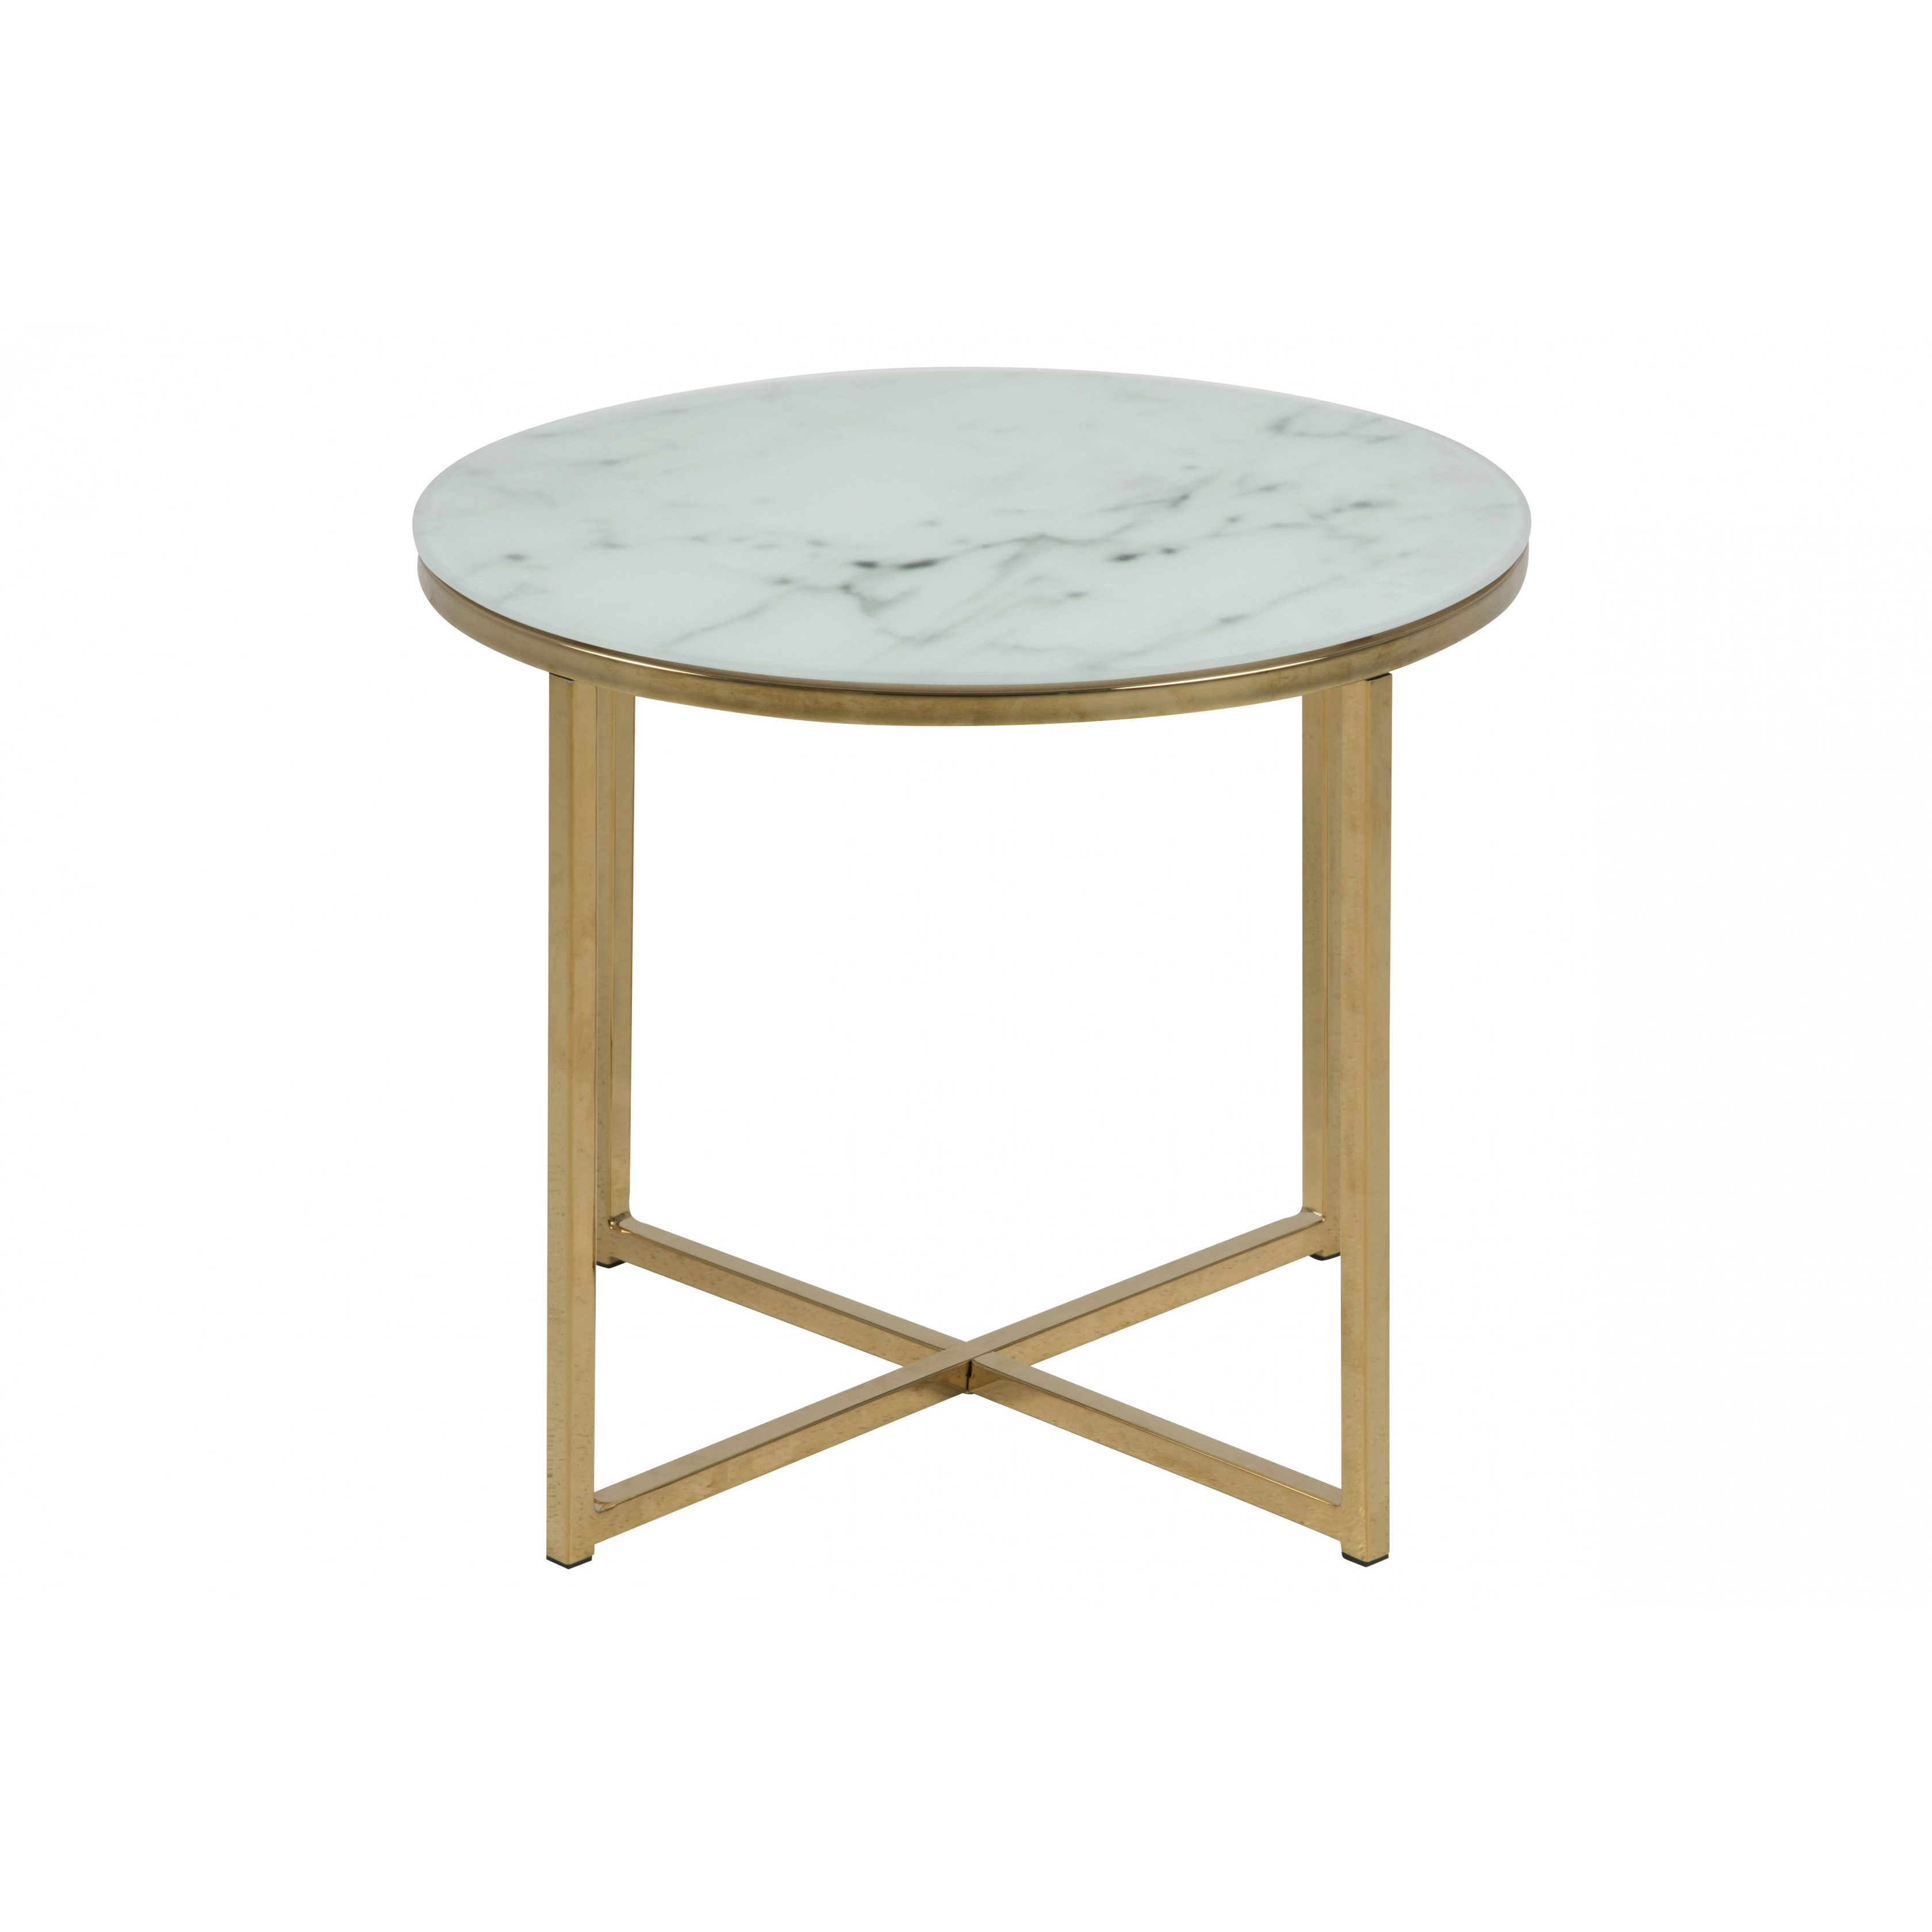 Table d'Appoint Ali Ø 50 | Blanc Marbre